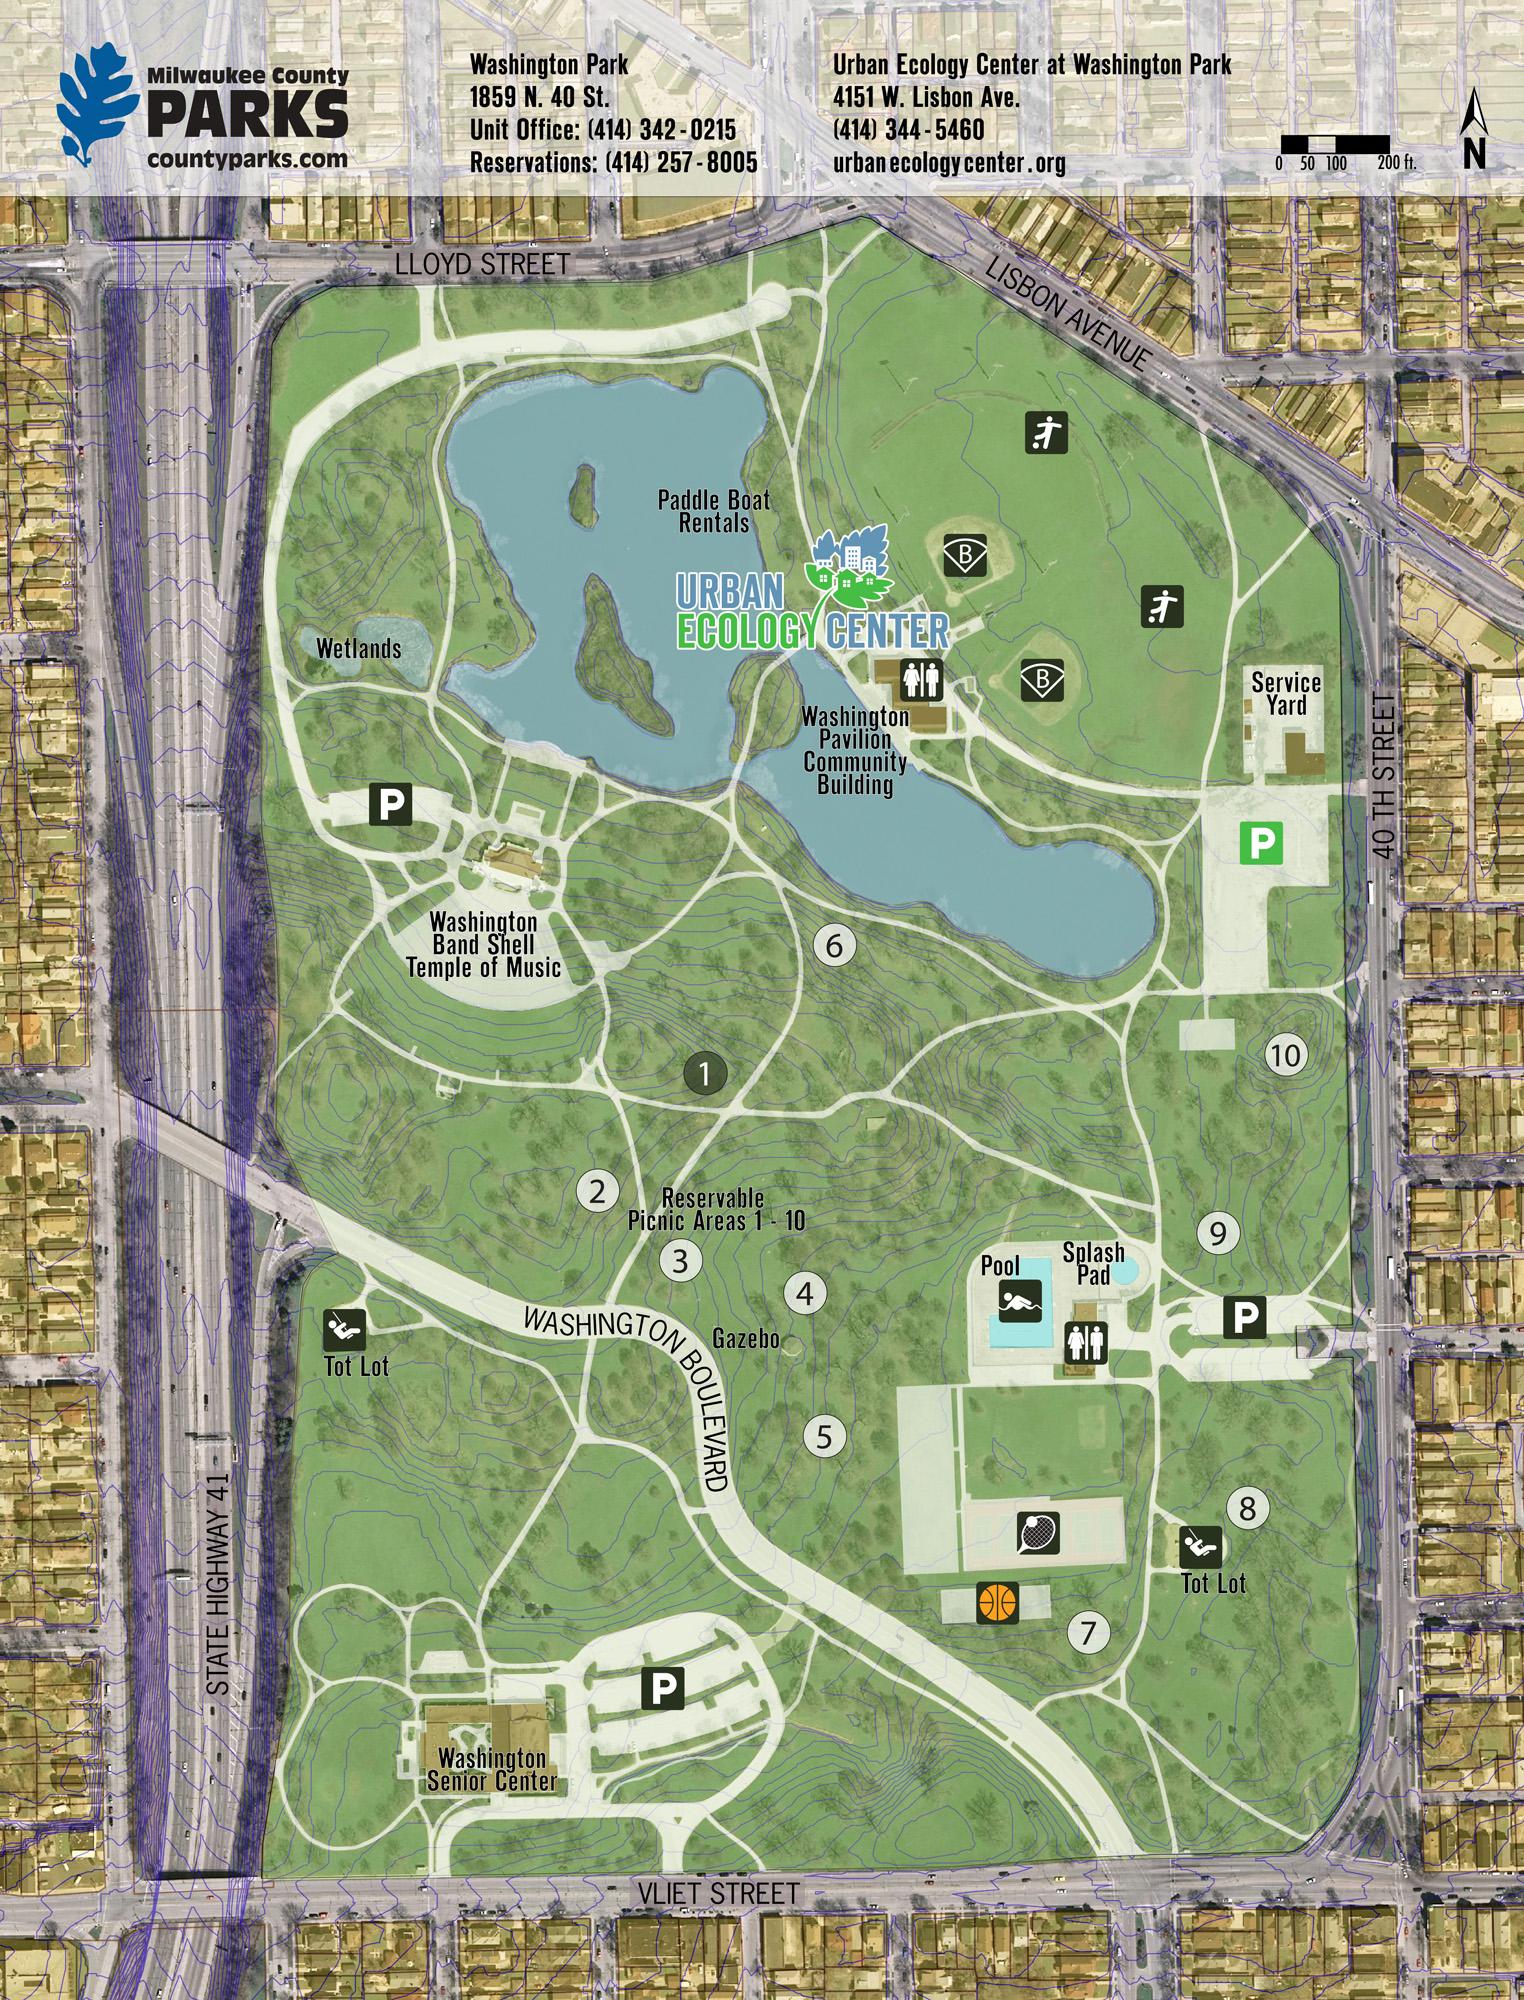 wp-newparkmap-LoP-aten.jpg